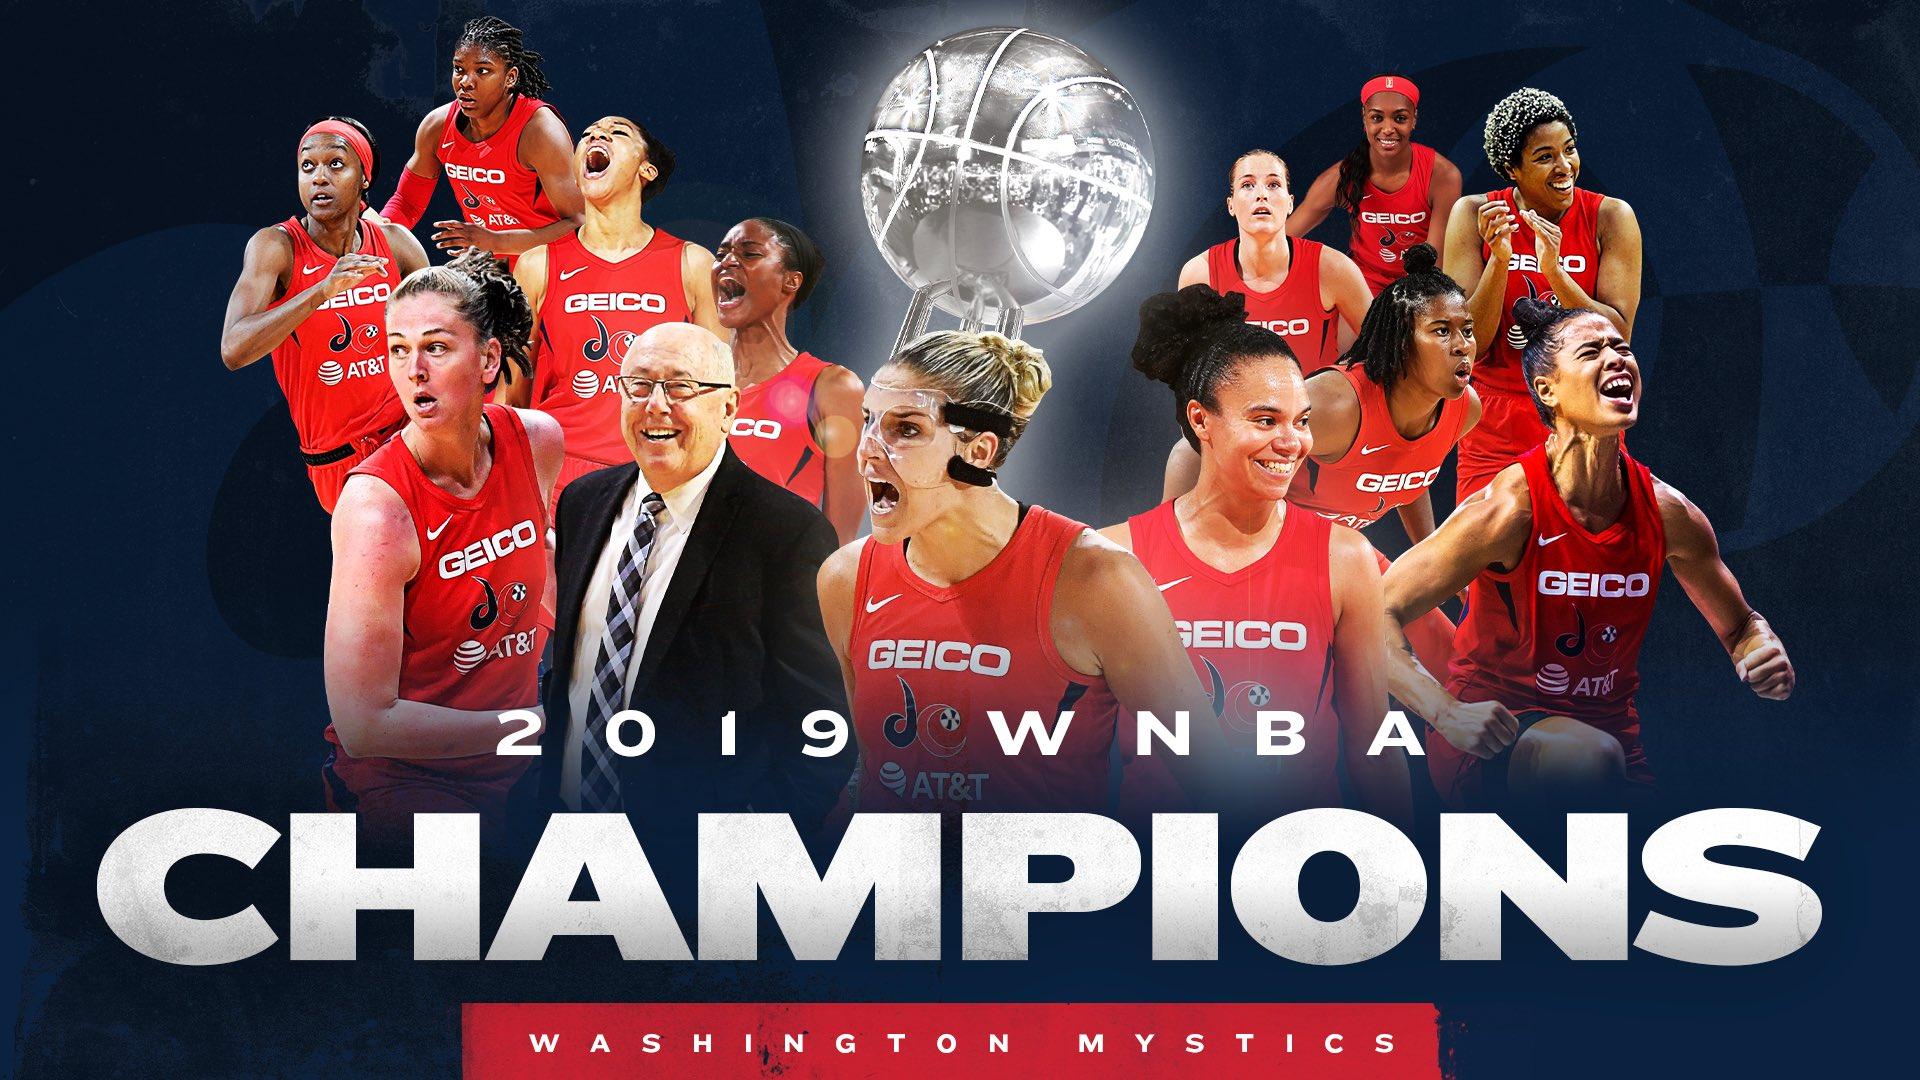 Washington Mystics win their first-ever WNBA championship, top the Connecticut Sun 89-78